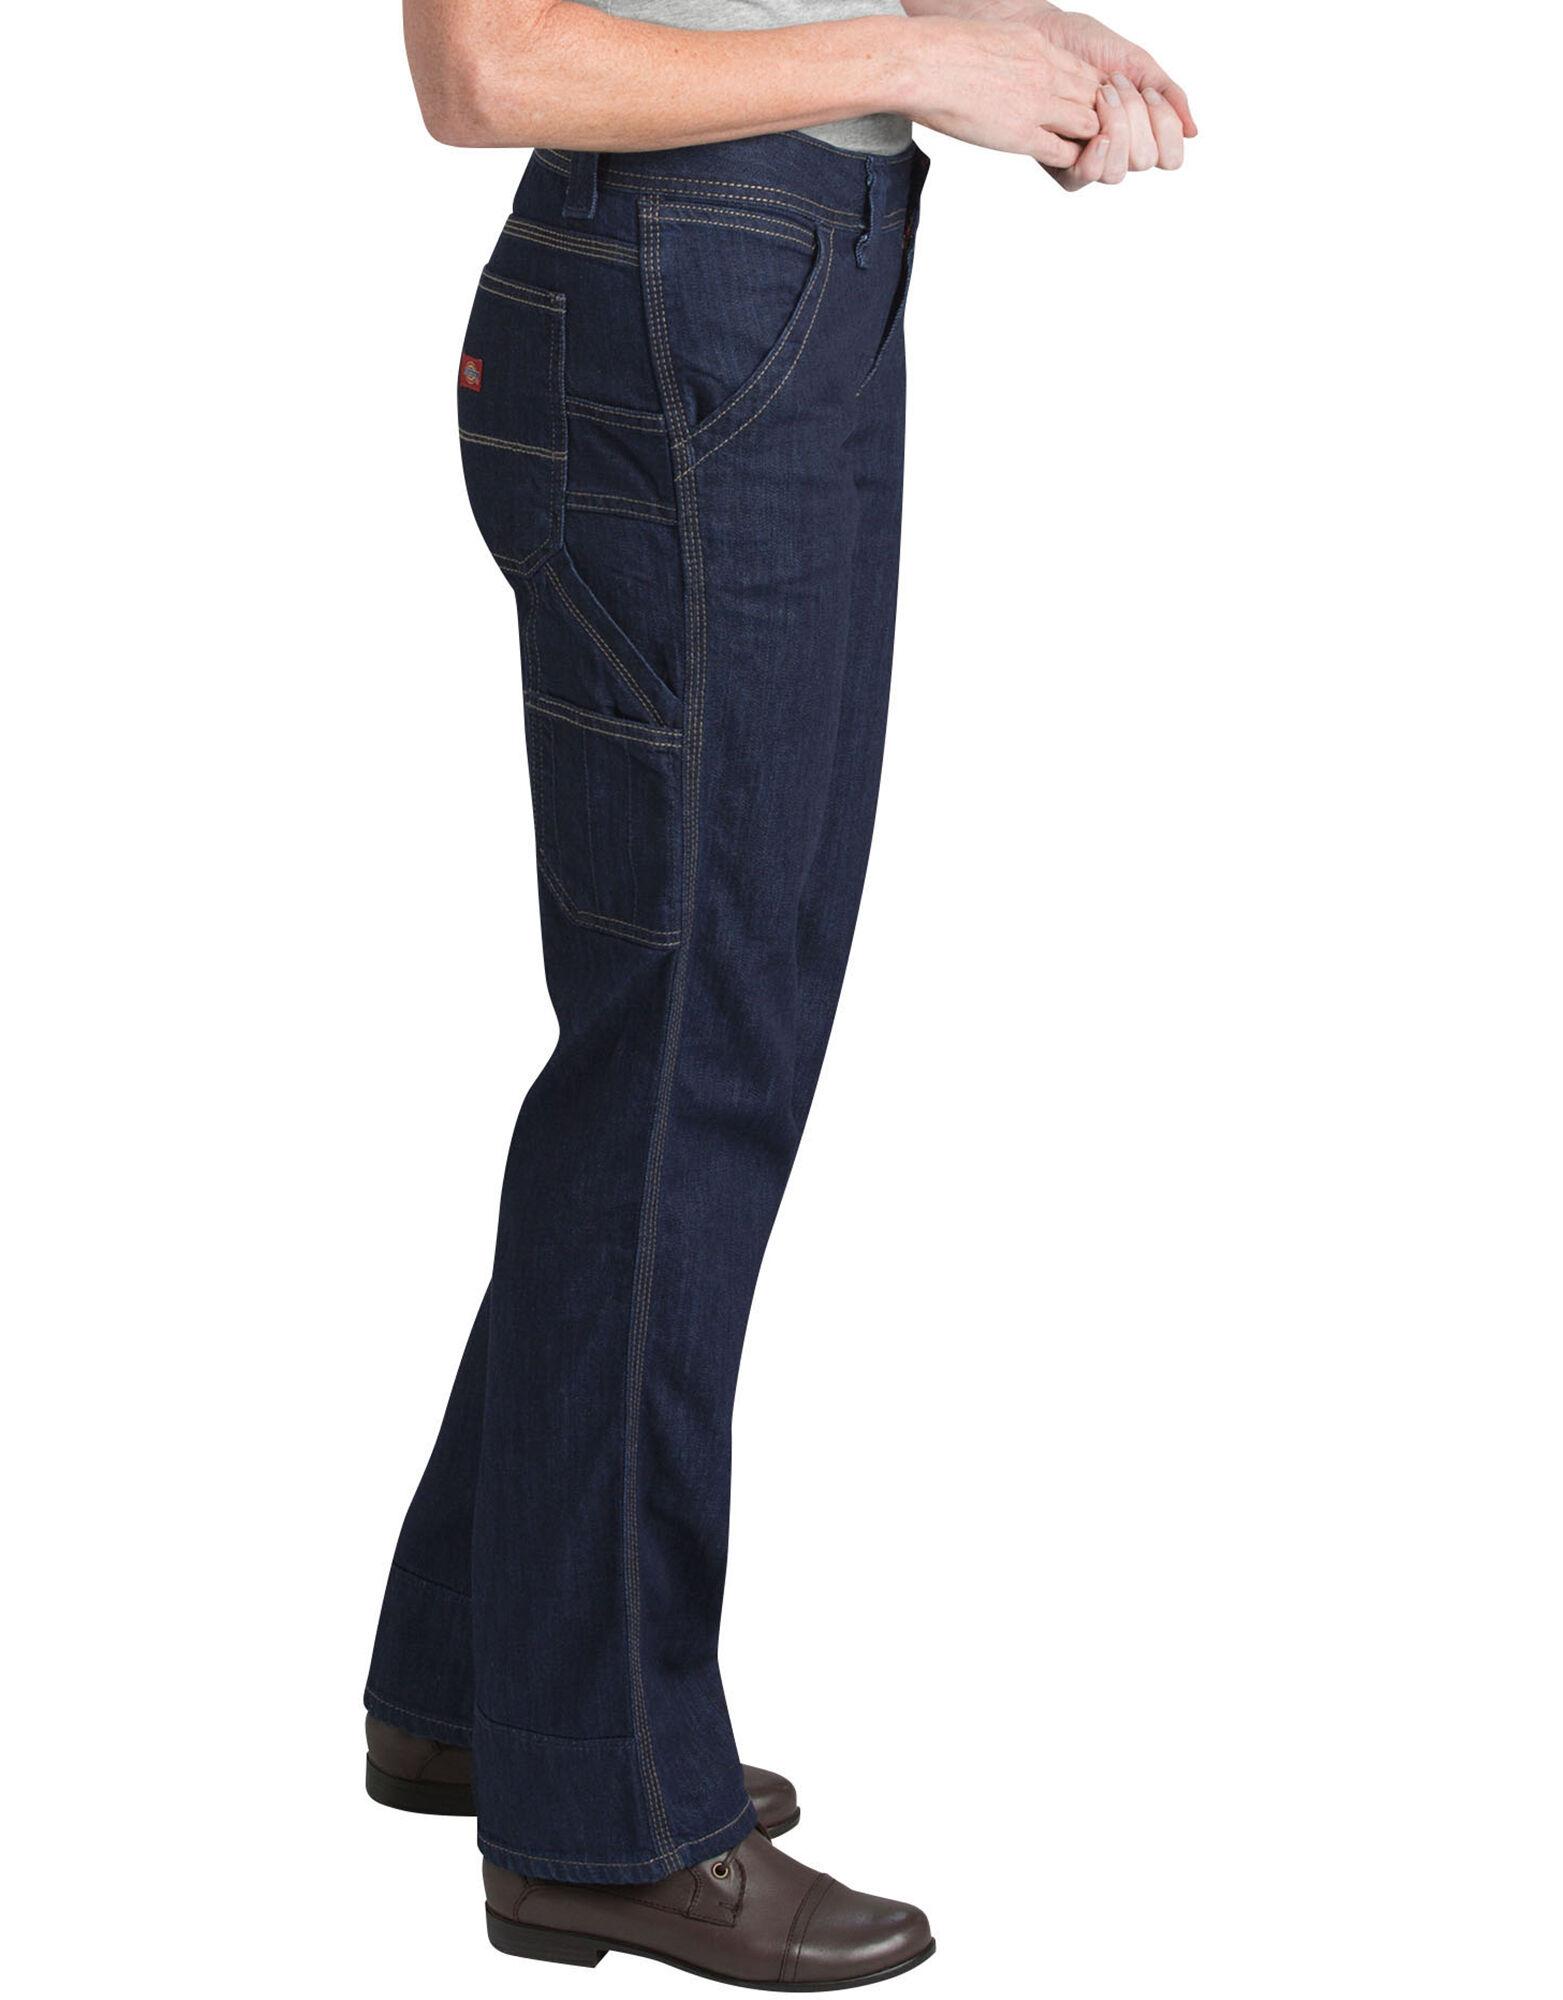 Women's Relaxed Fit Carpenter Denim Jean | Womens Jeans | Dickies